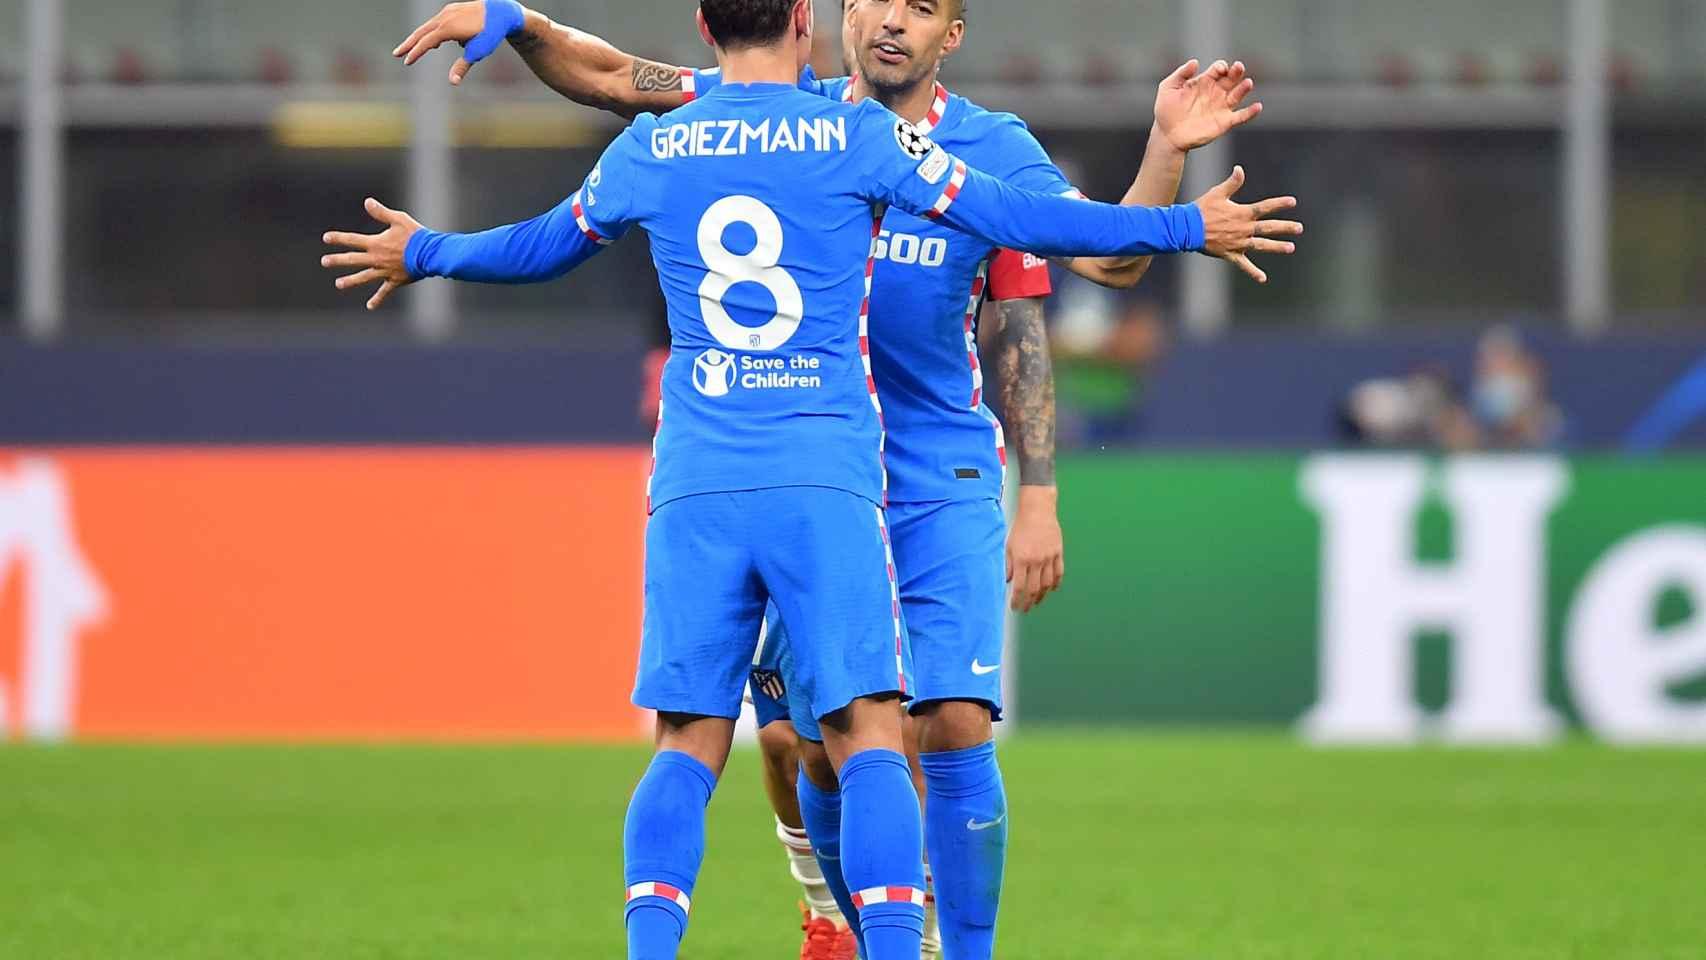 Griezmann y Suárez se abrazan